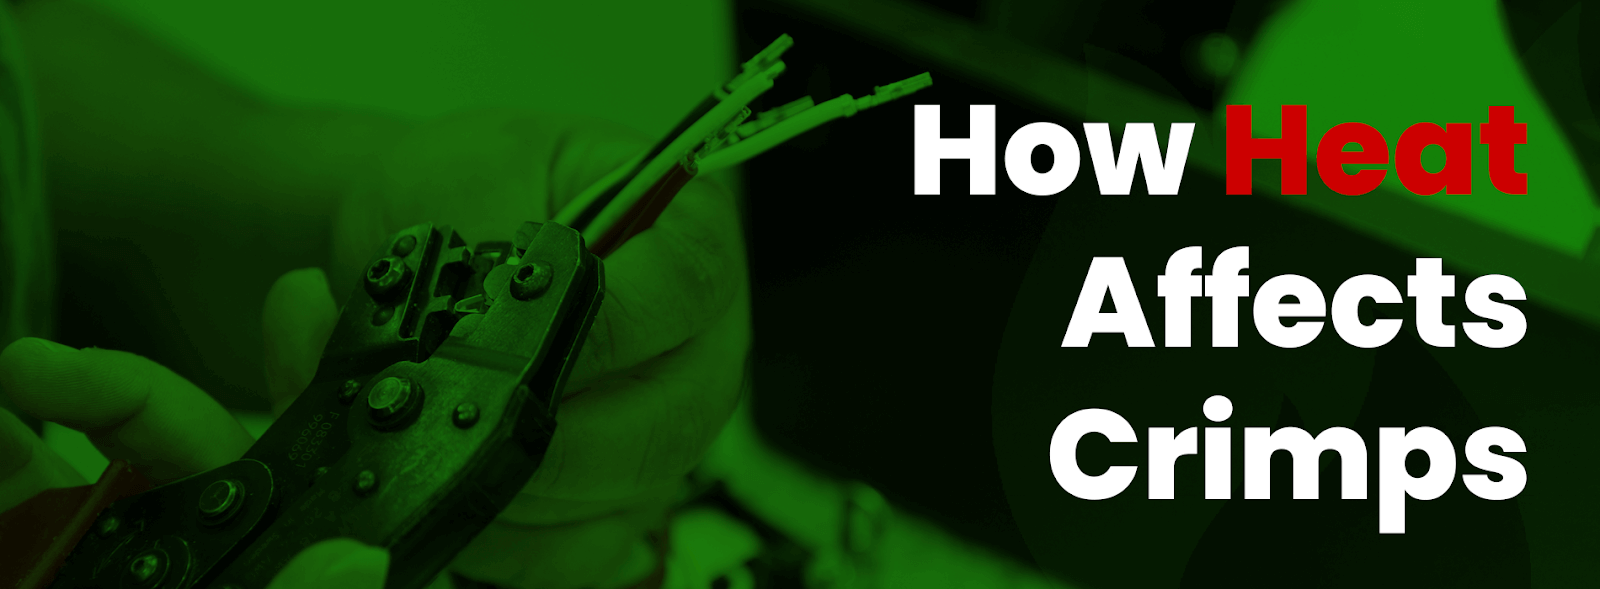 How Heat Affects Crimps Blog Header